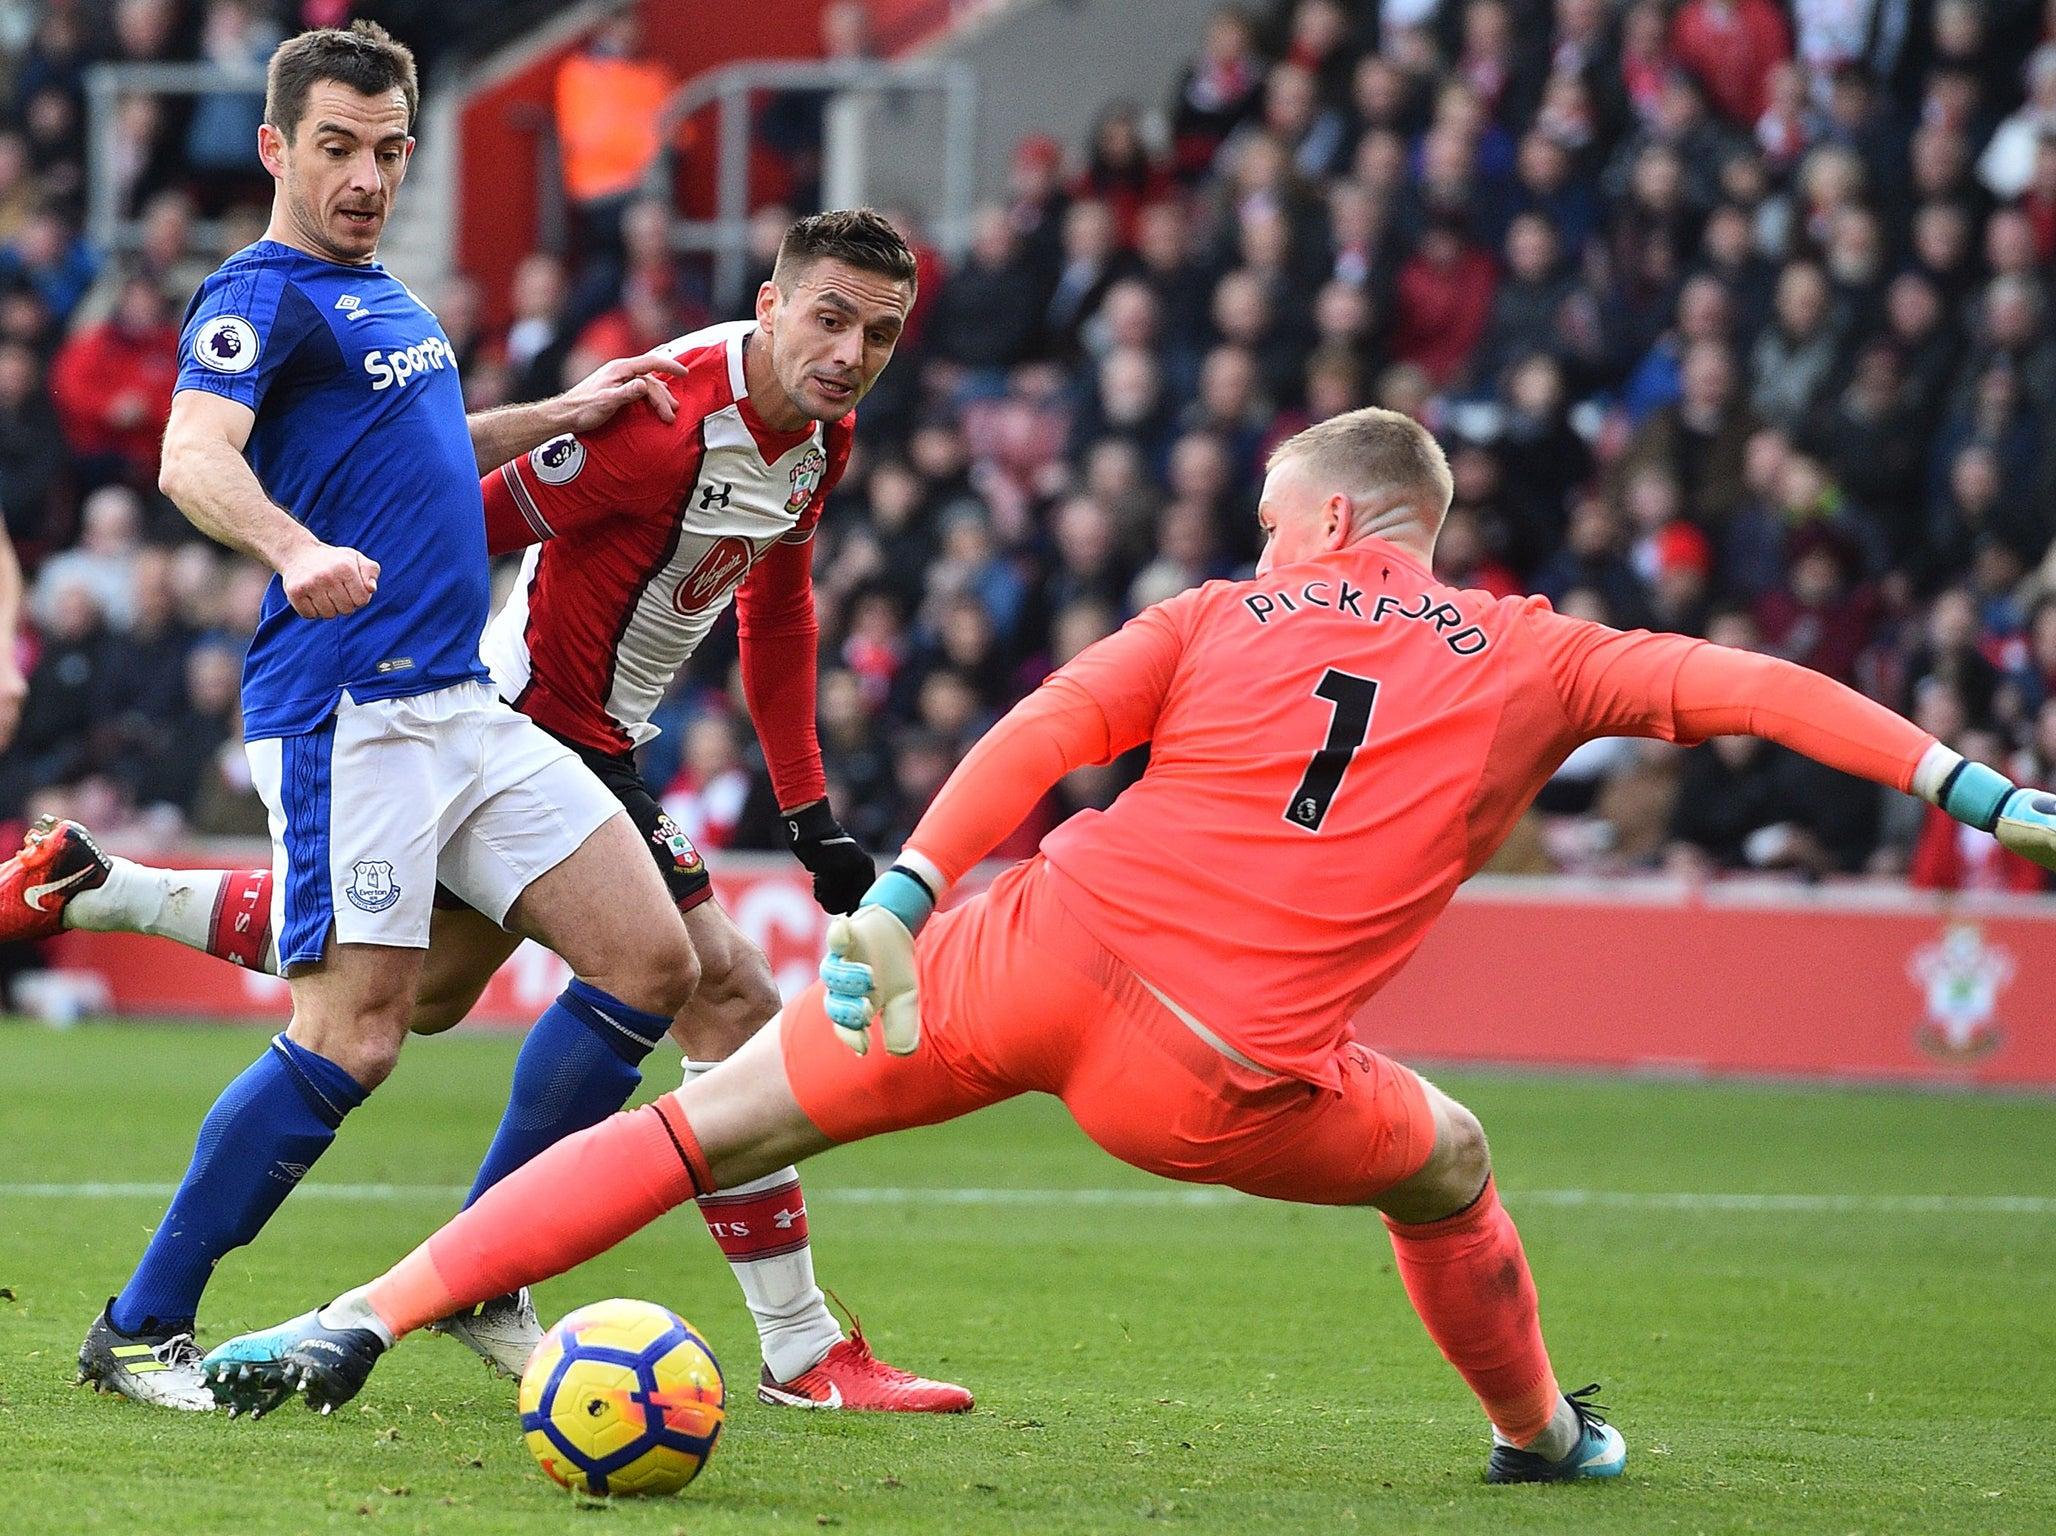 Southampton vs Everton live: Latest score as sublime Gylfi Sigurdsson strike cancels out Dusan Tadic's opener